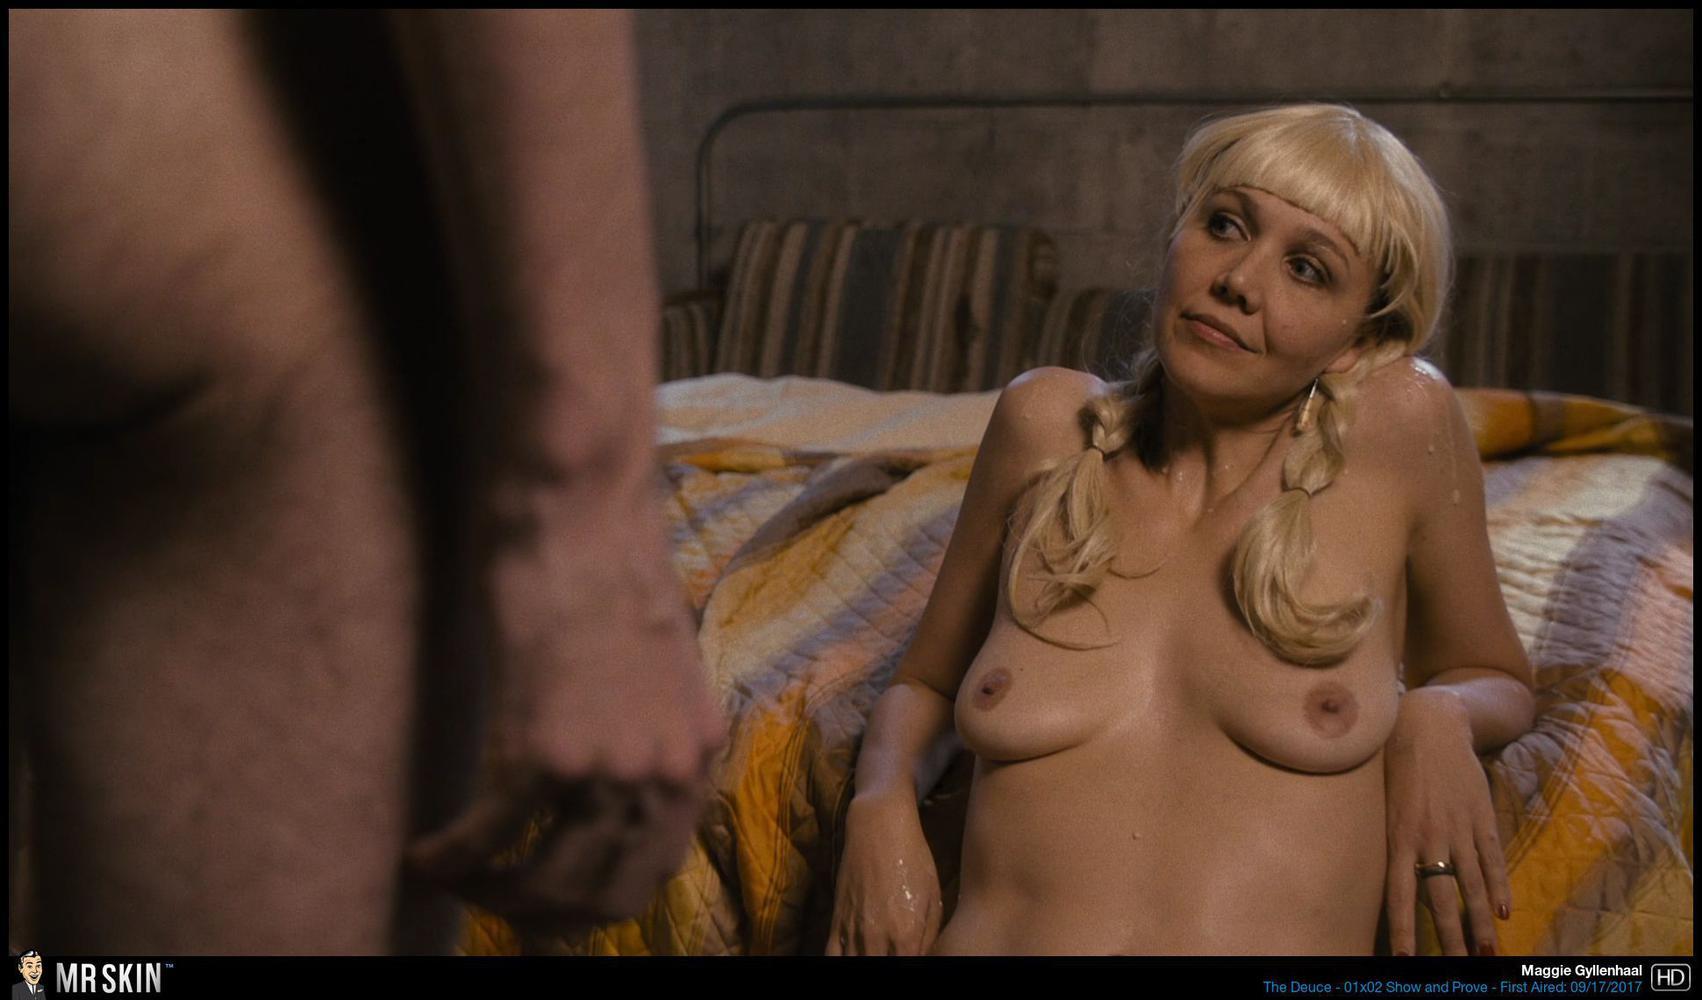 image Laura prepon finally topless